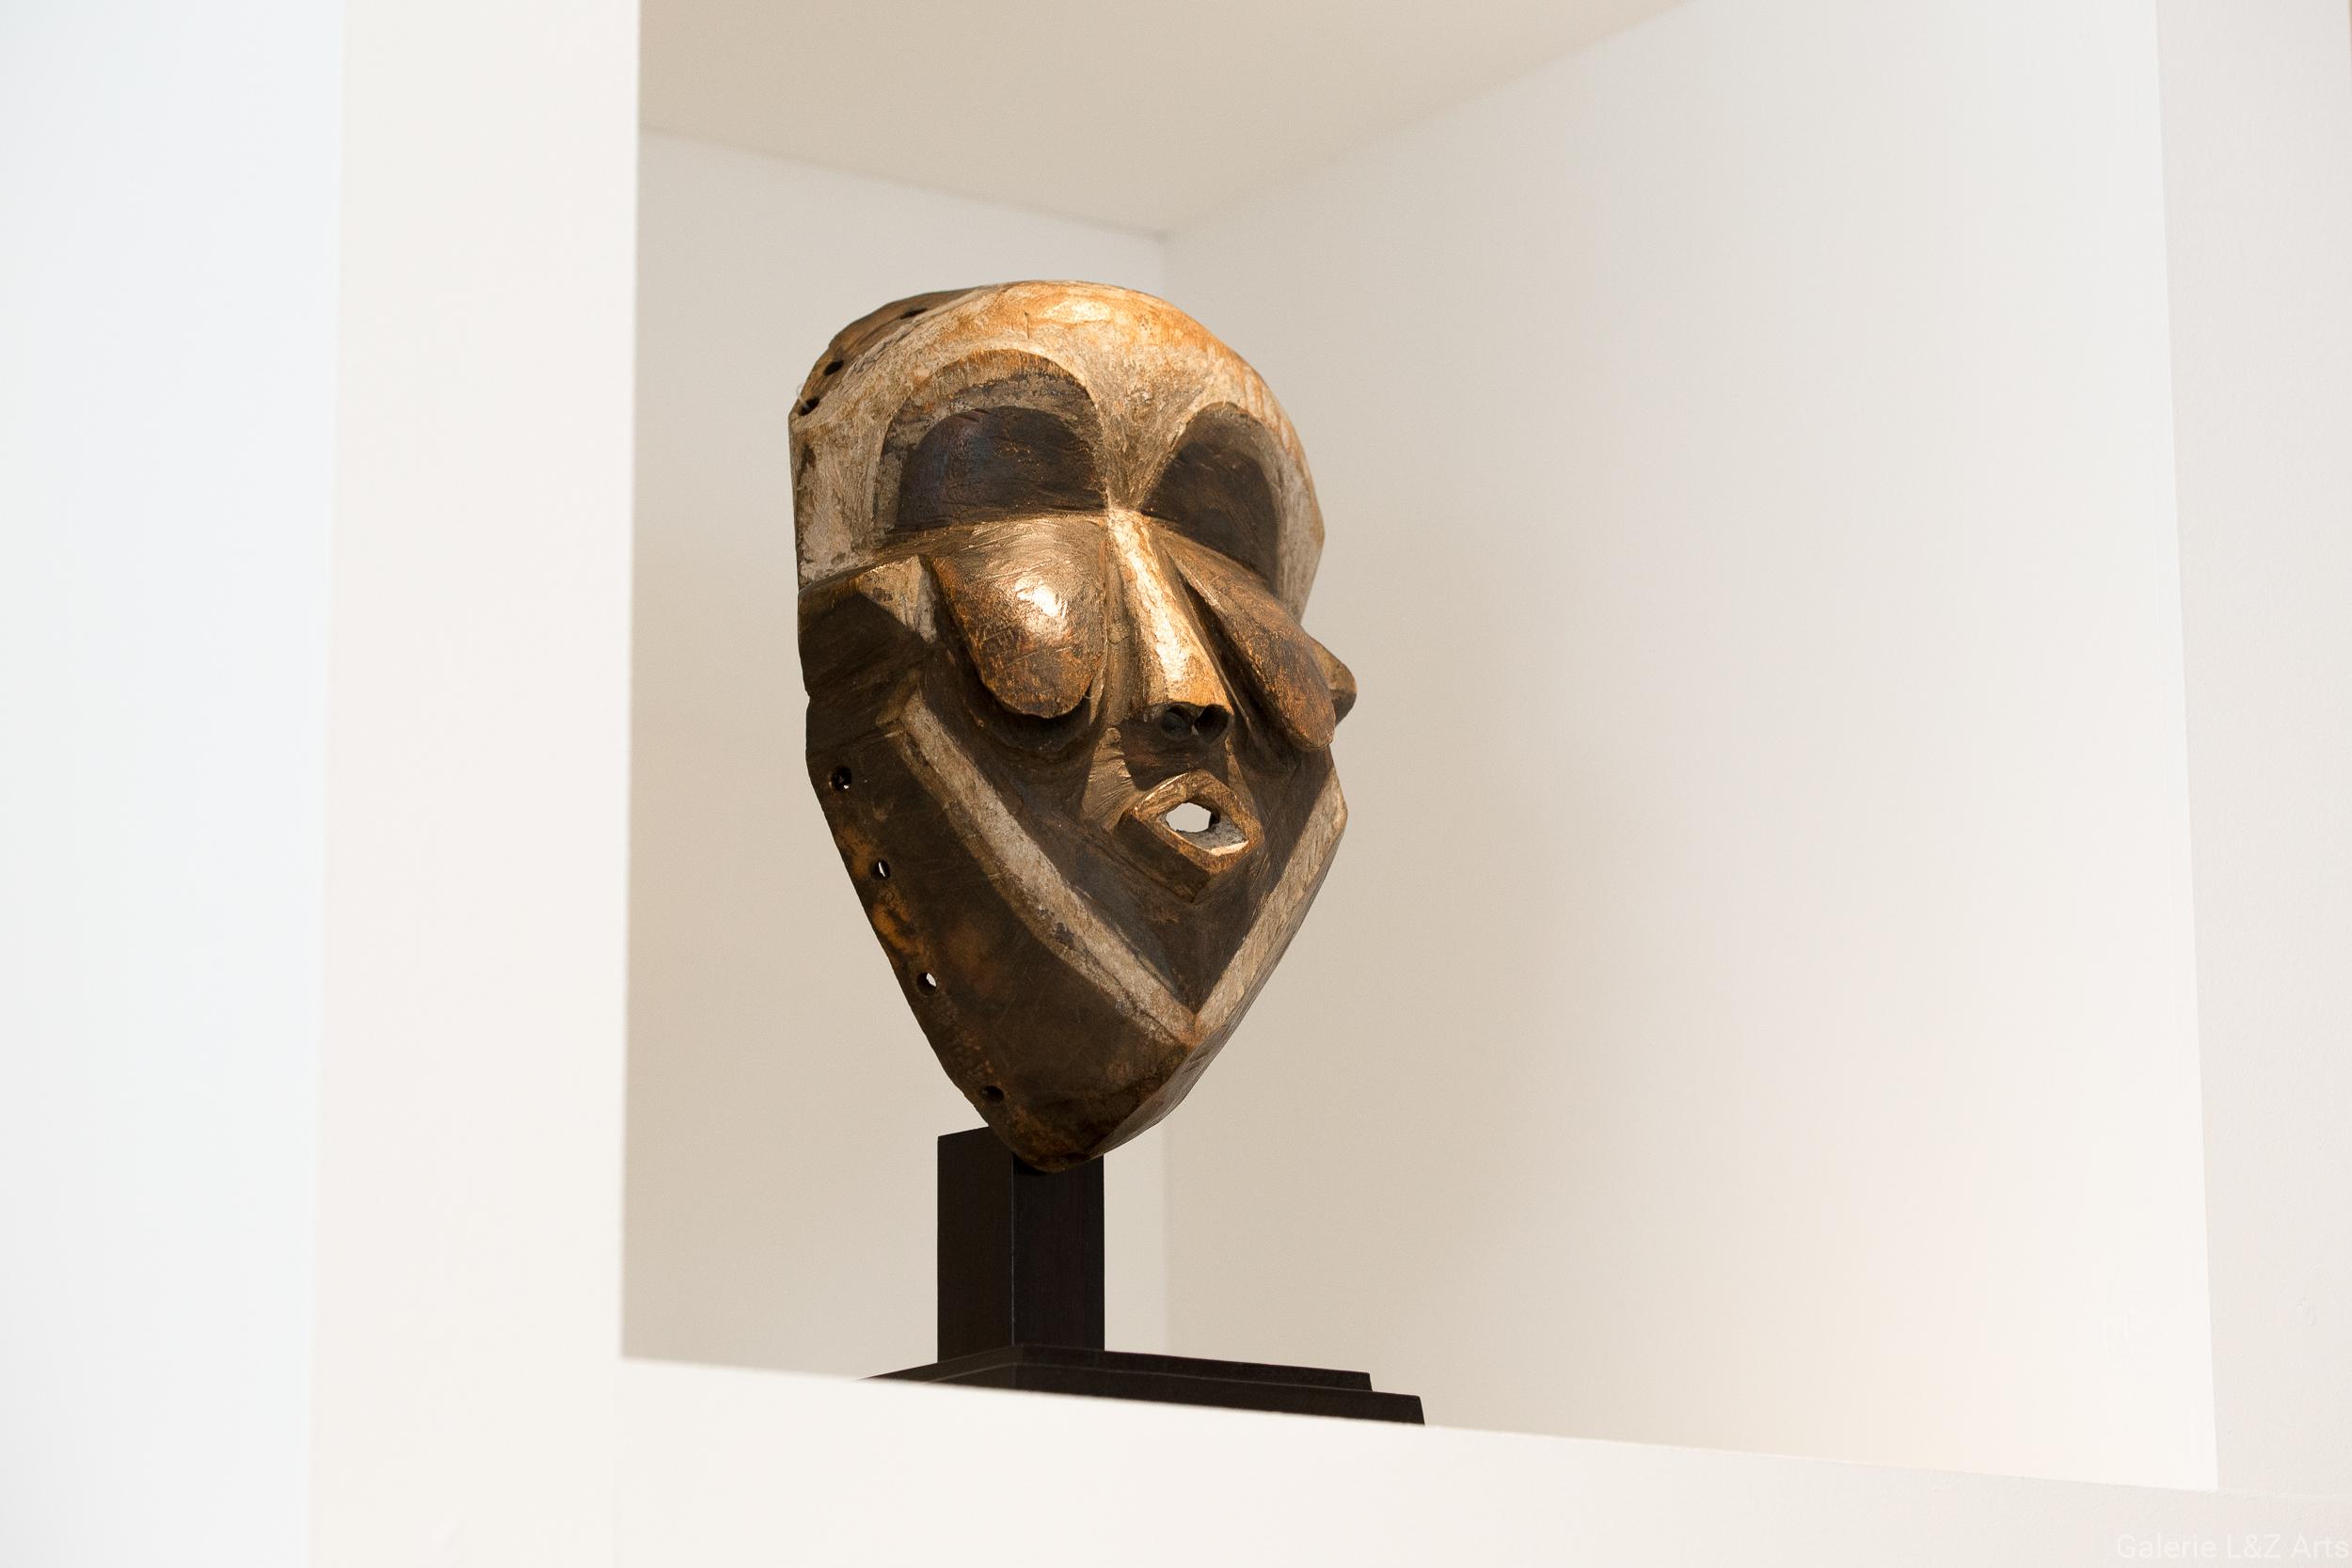 tribal-art-oostende-ostende-exposition-galerie-lz-art-africain-belgique-13.jpg